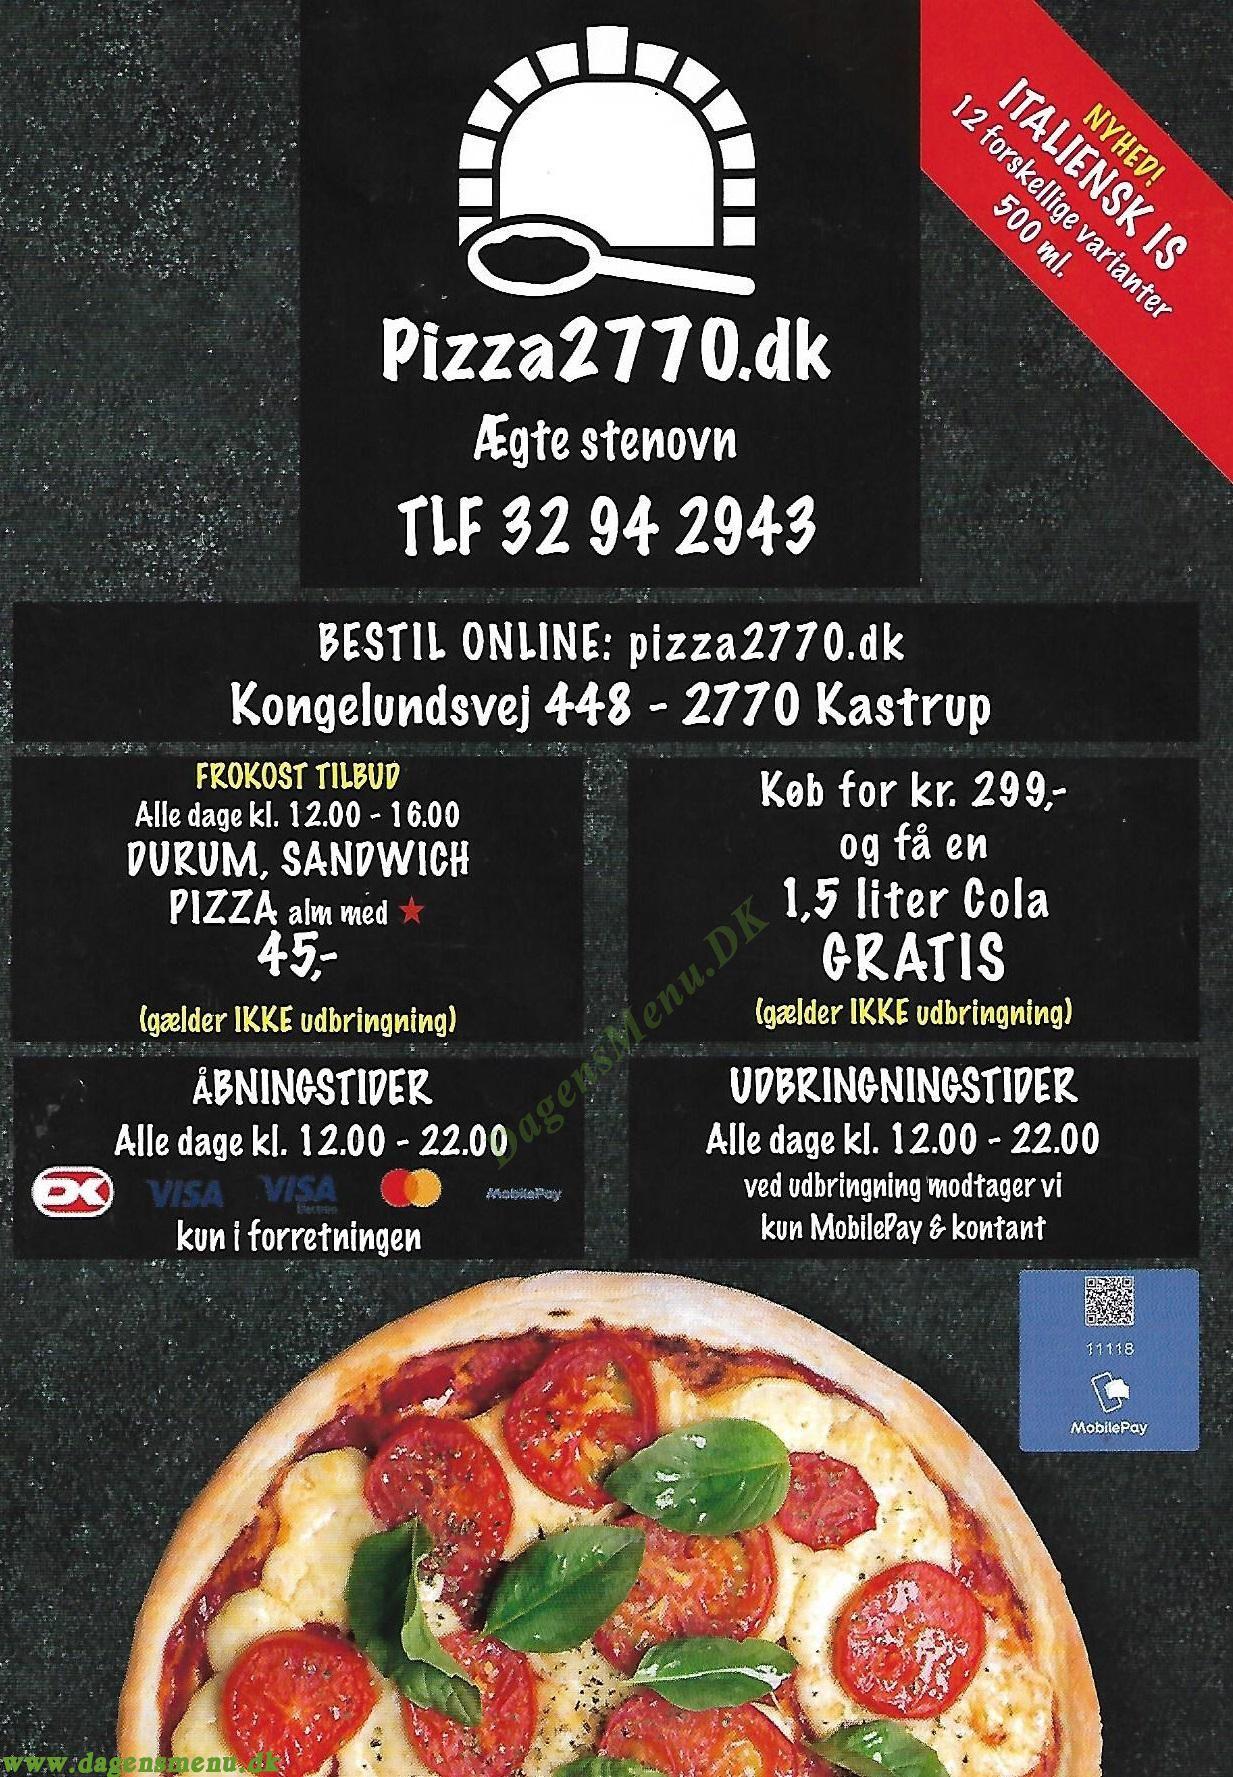 Pizza 2770 - Menukort